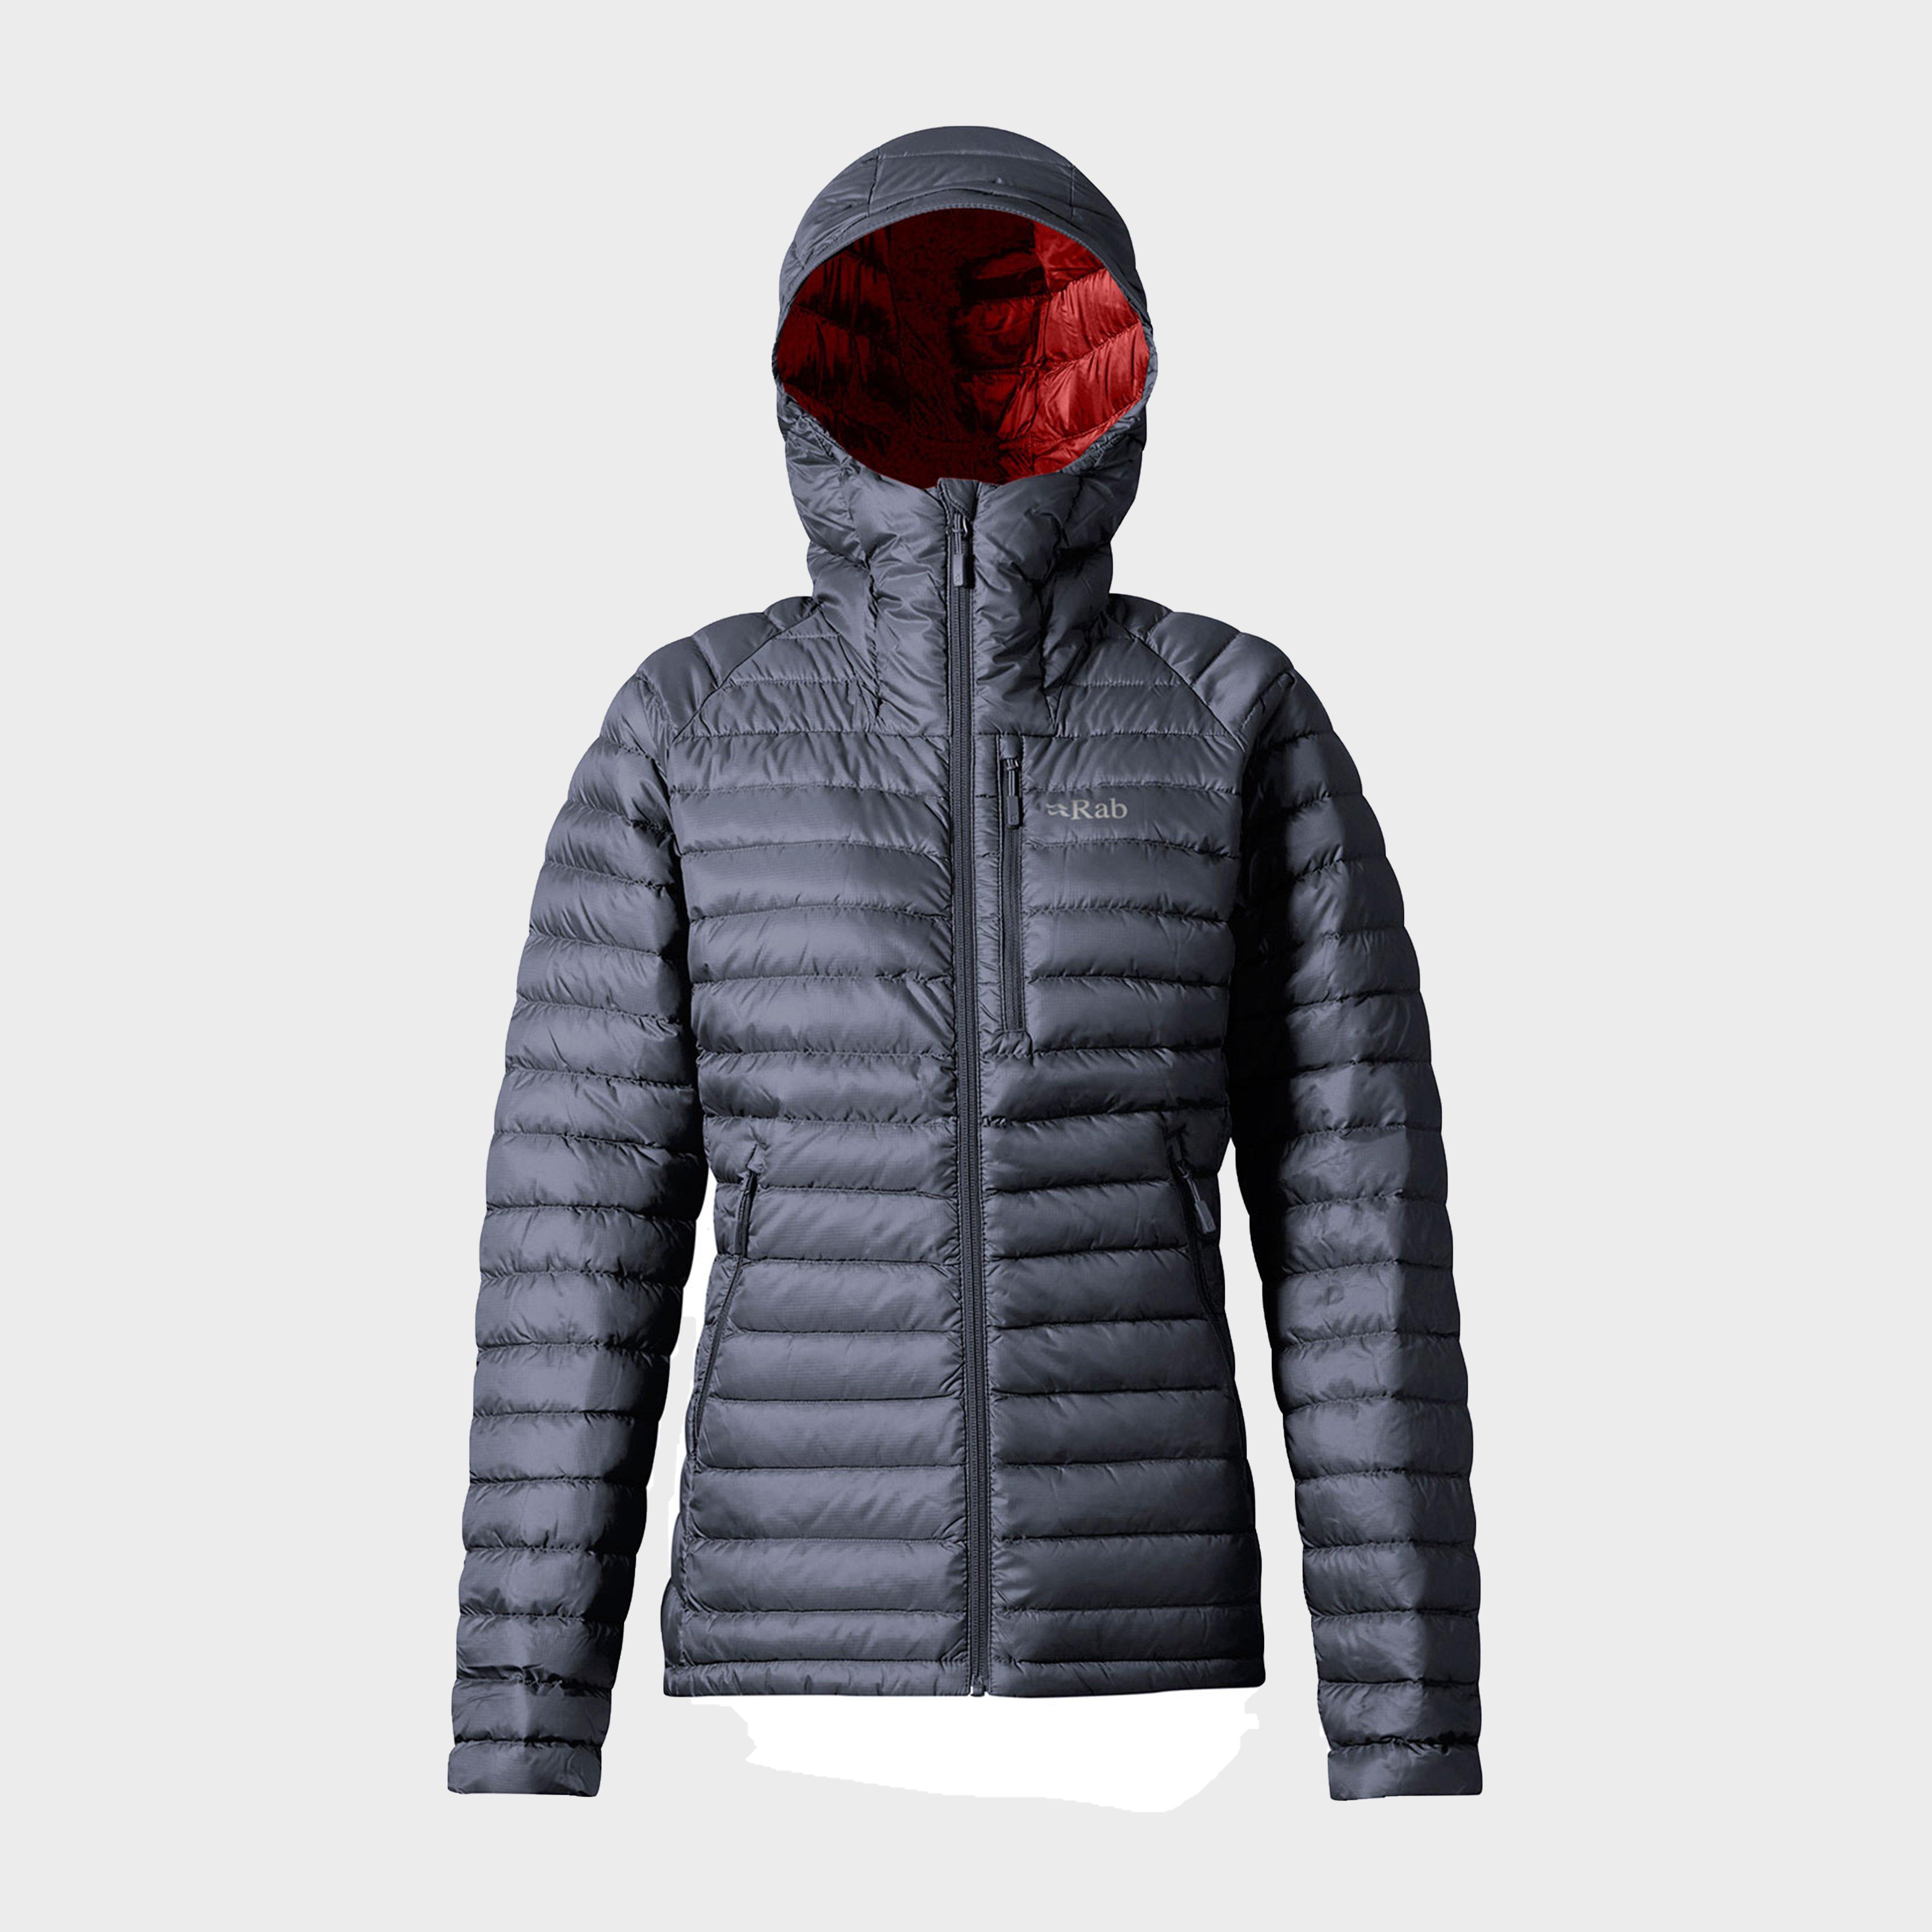 Rab Rab Womens Microlight Alpine Long Down Jacket - N/A, N/A